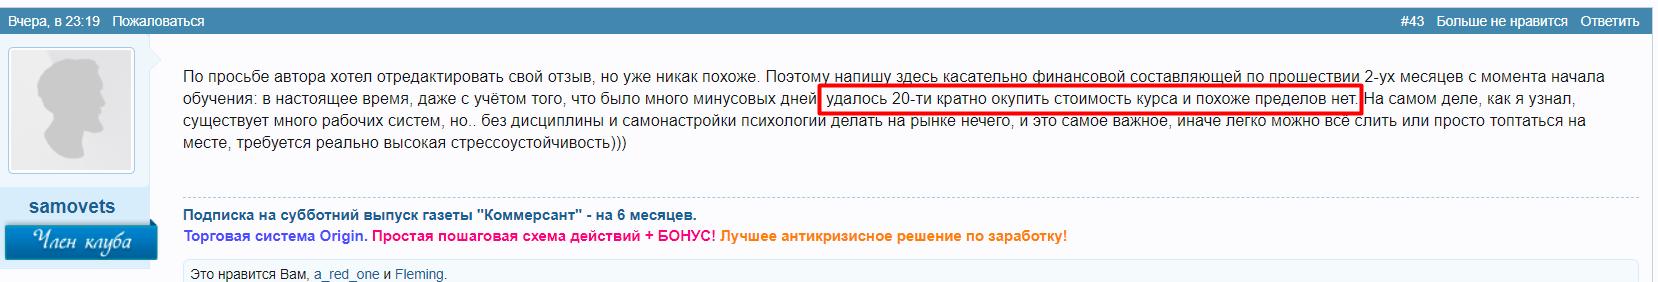 Screenshot_345.png